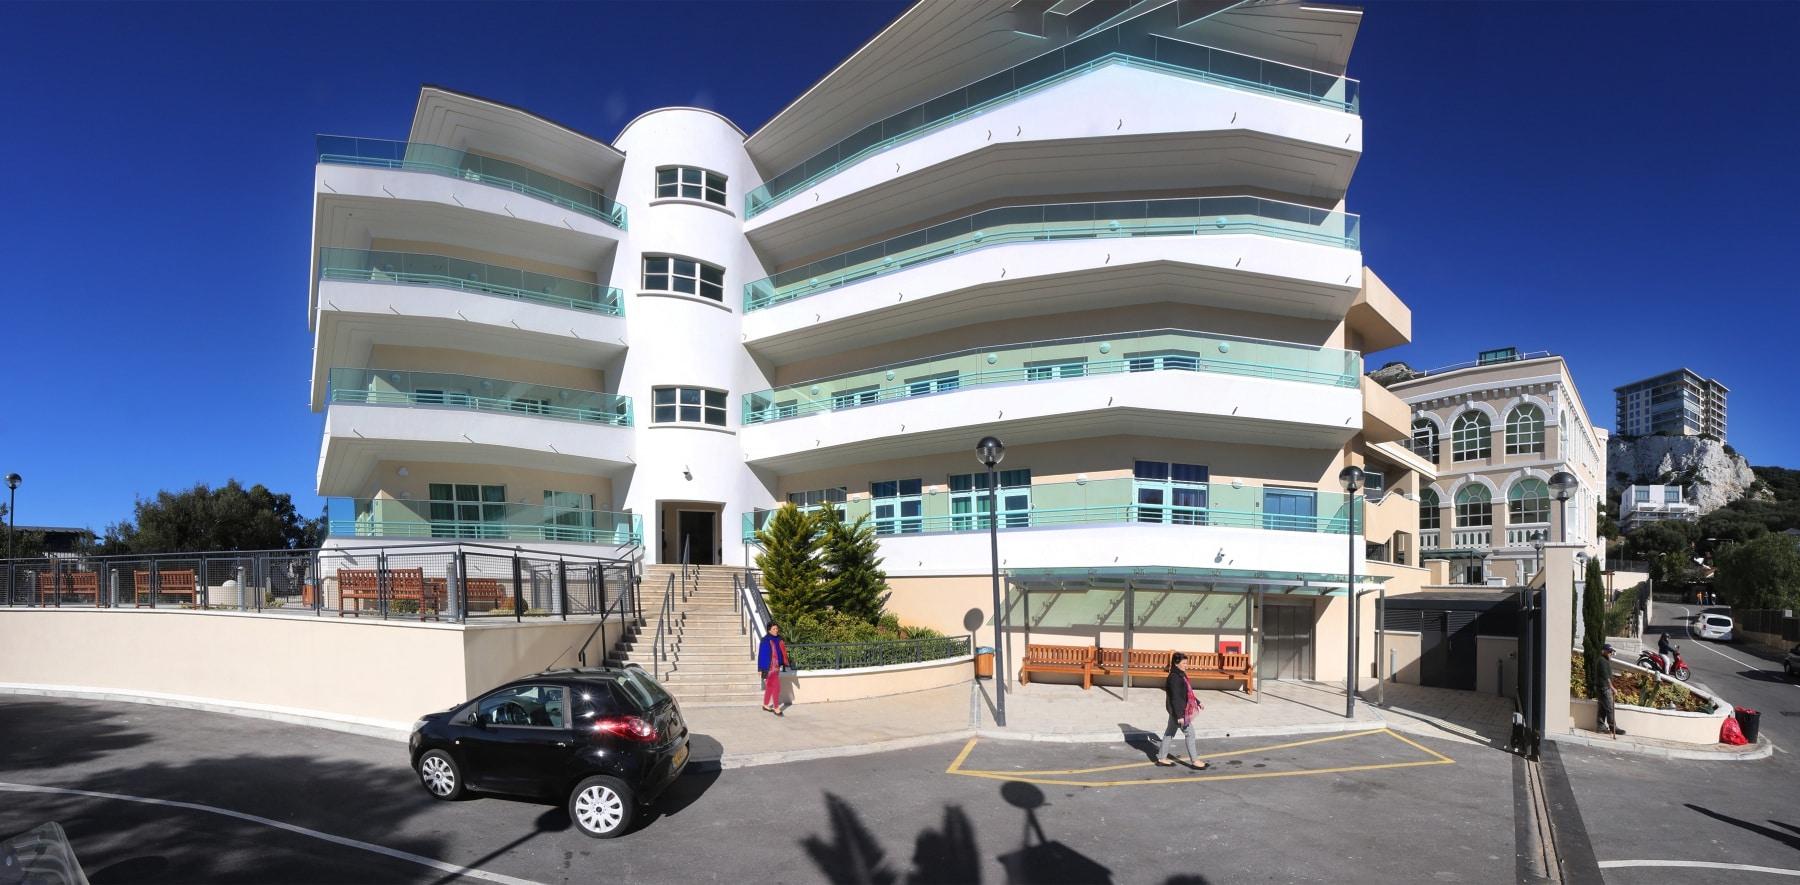 dementia-day-centre-panorama2_32308837186_o